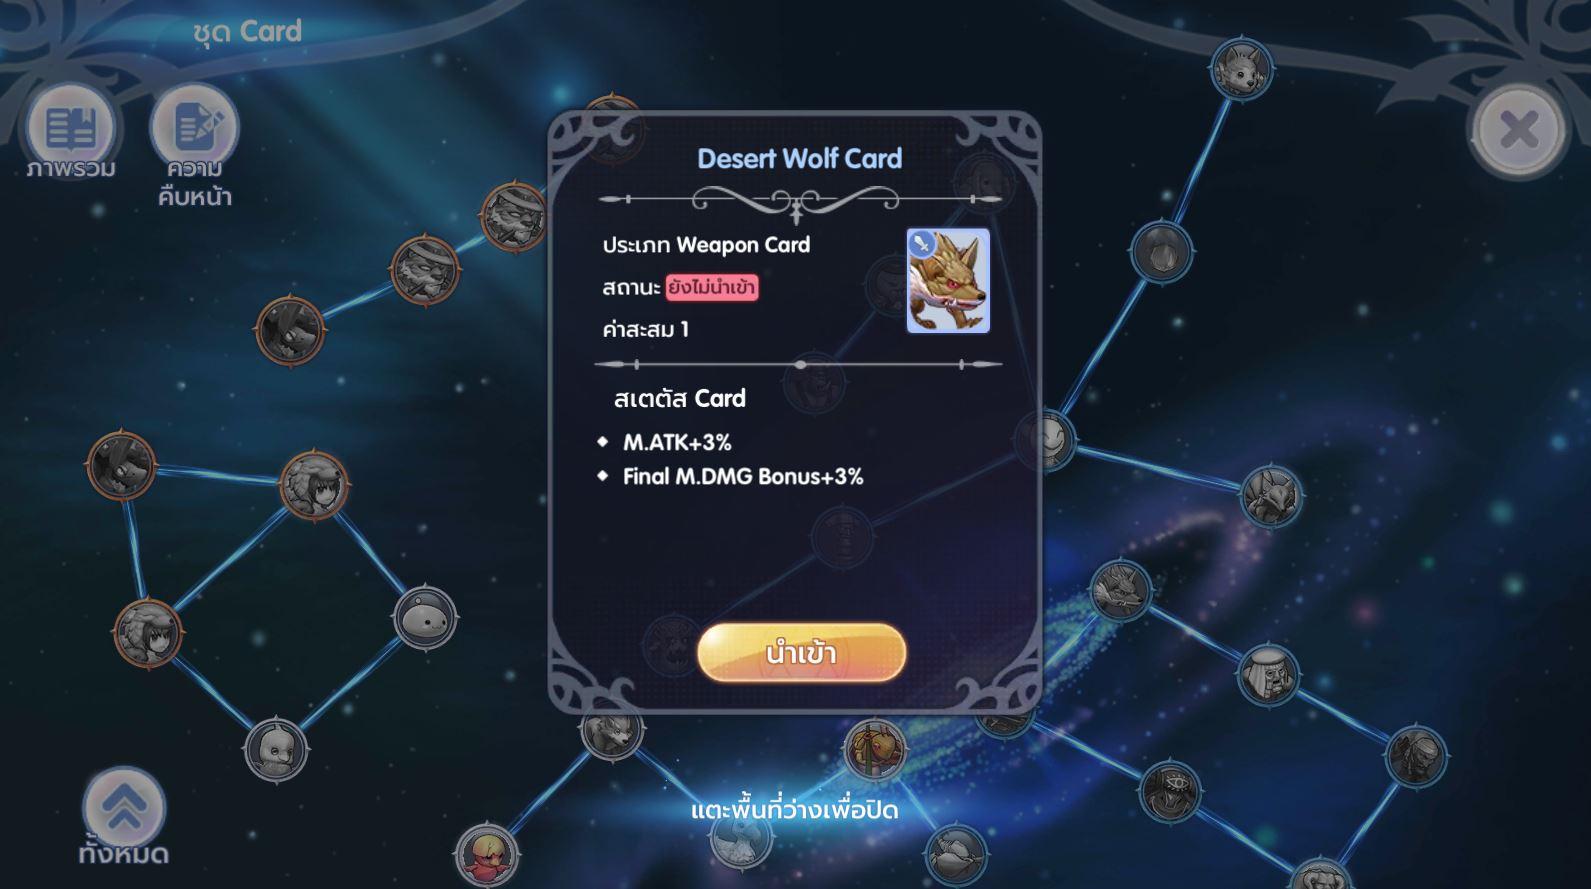 ROX การ์ดสายเวท Desert Wolf Card